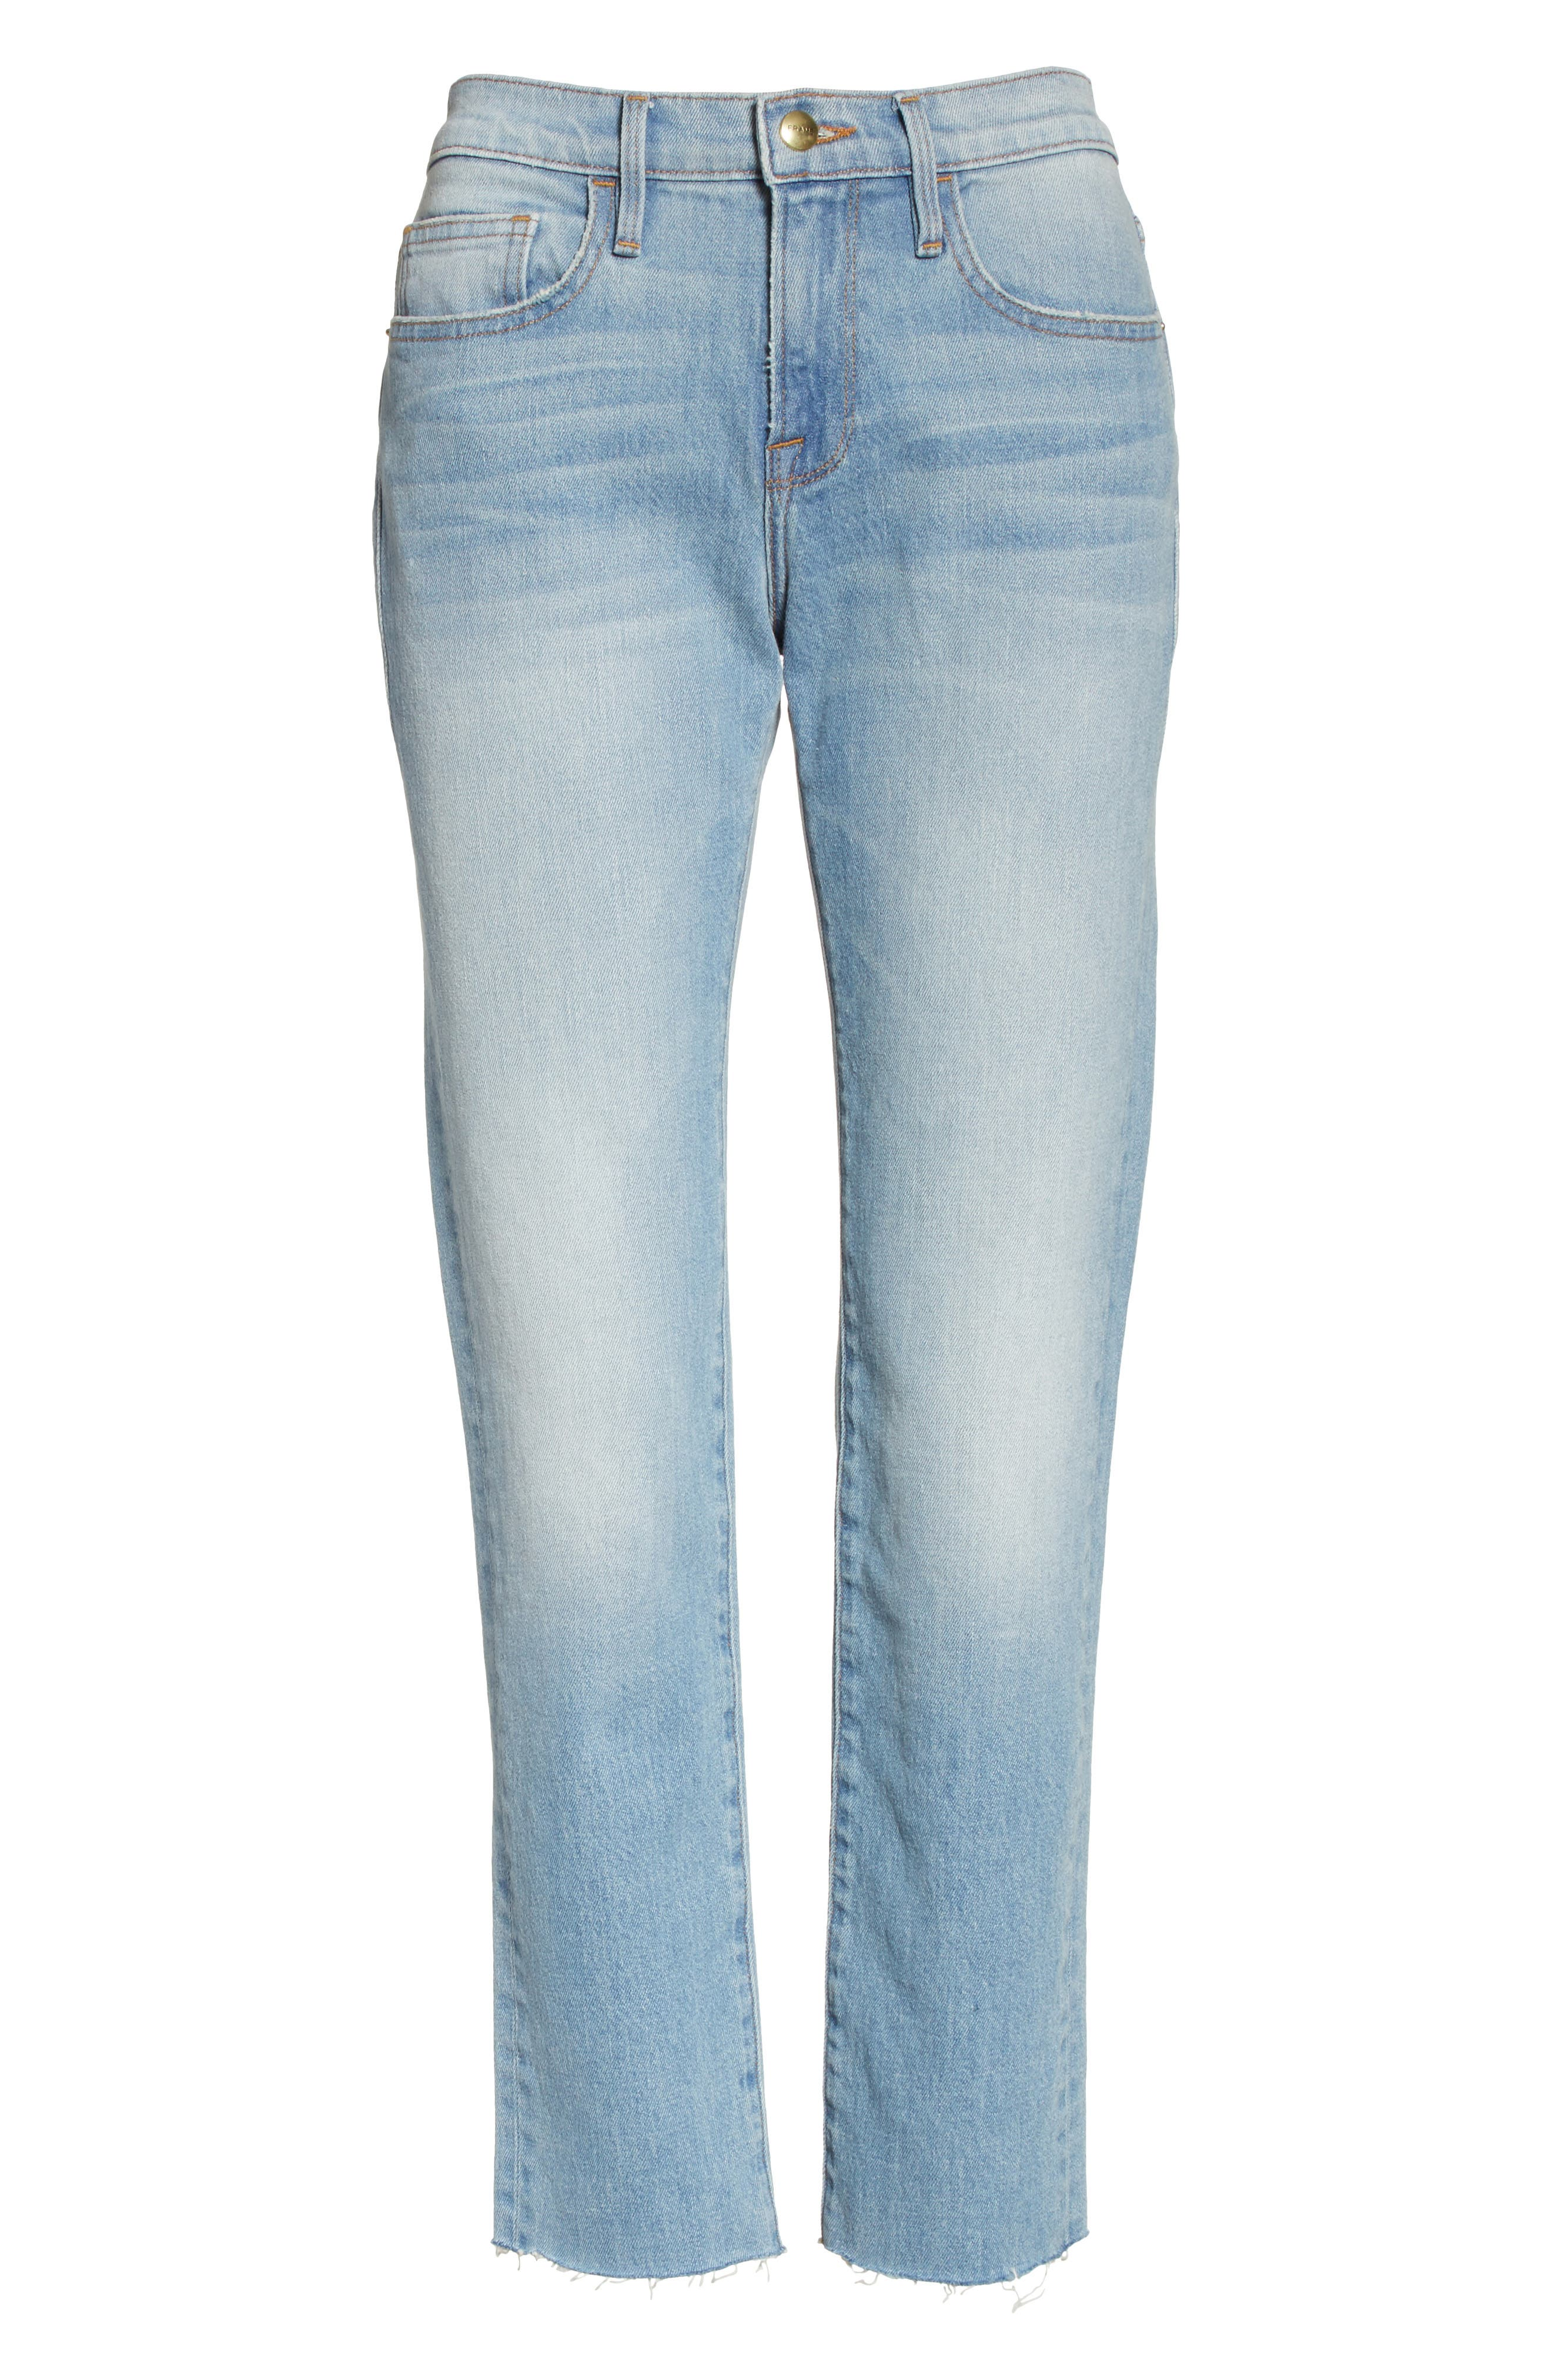 Le Boy High Waist Raw Hem Jeans,                             Alternate thumbnail 6, color,                             Pamder End